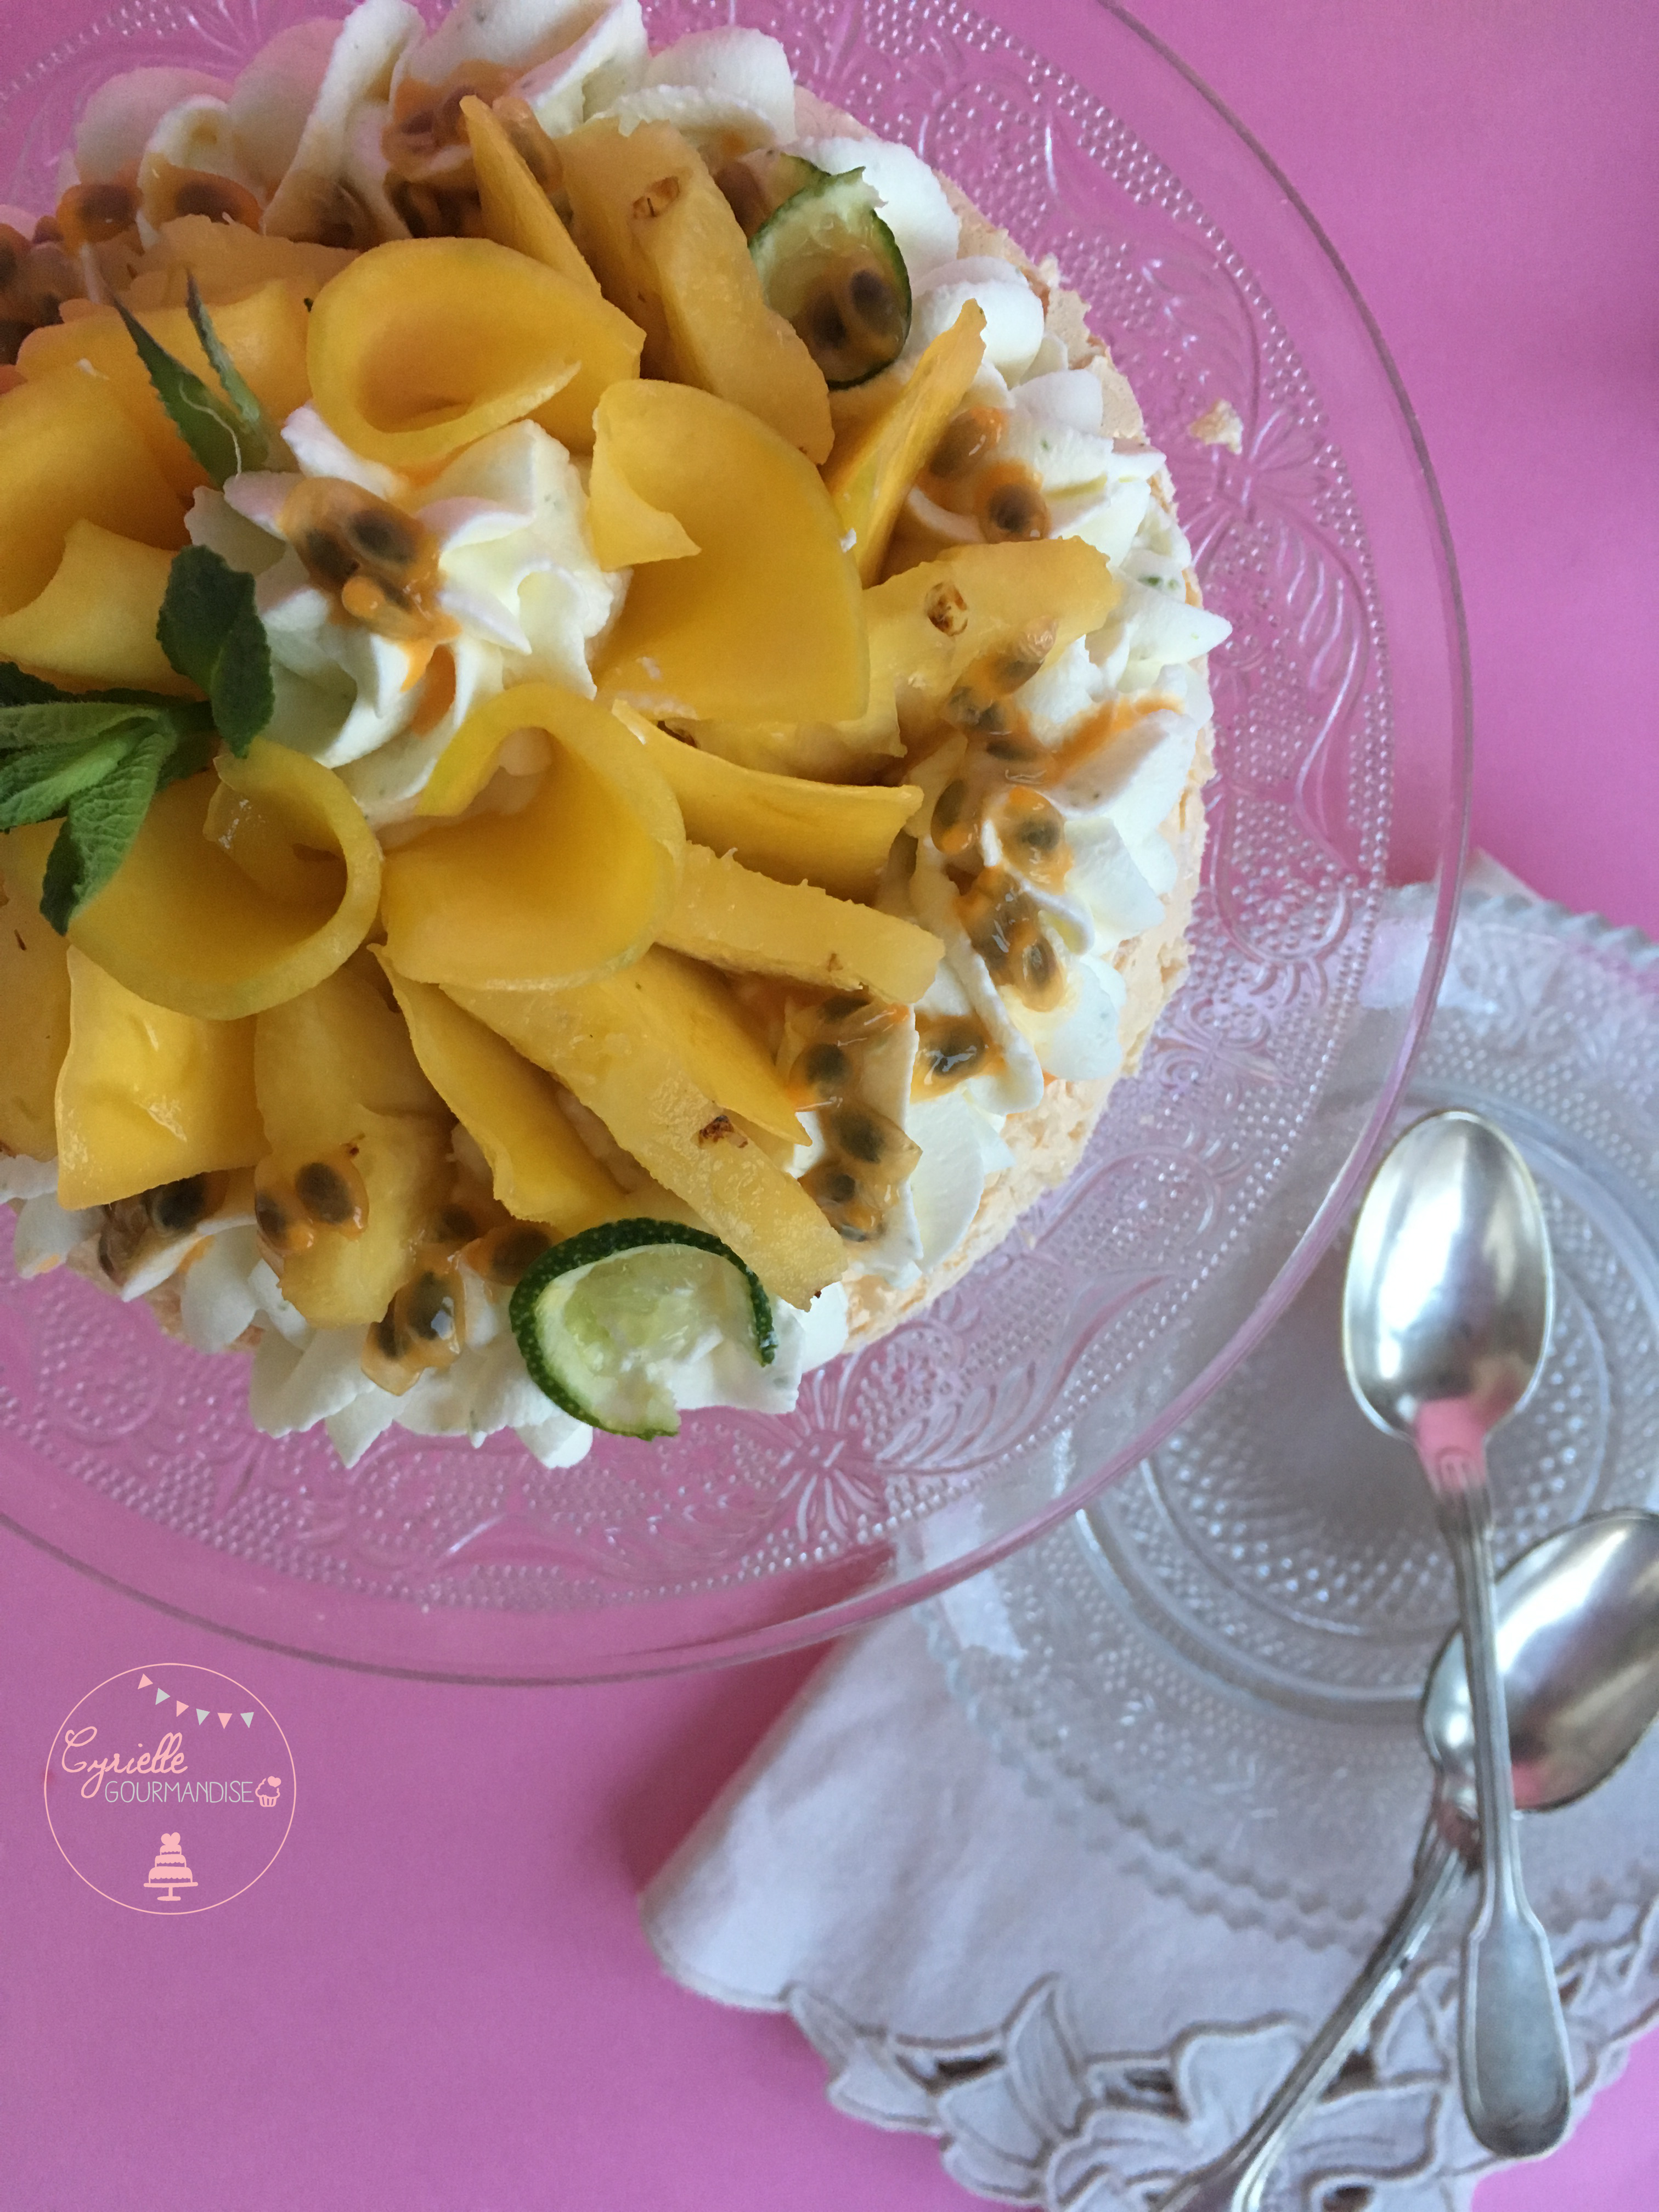 Pavlova Fruits exotiques citron vert 7